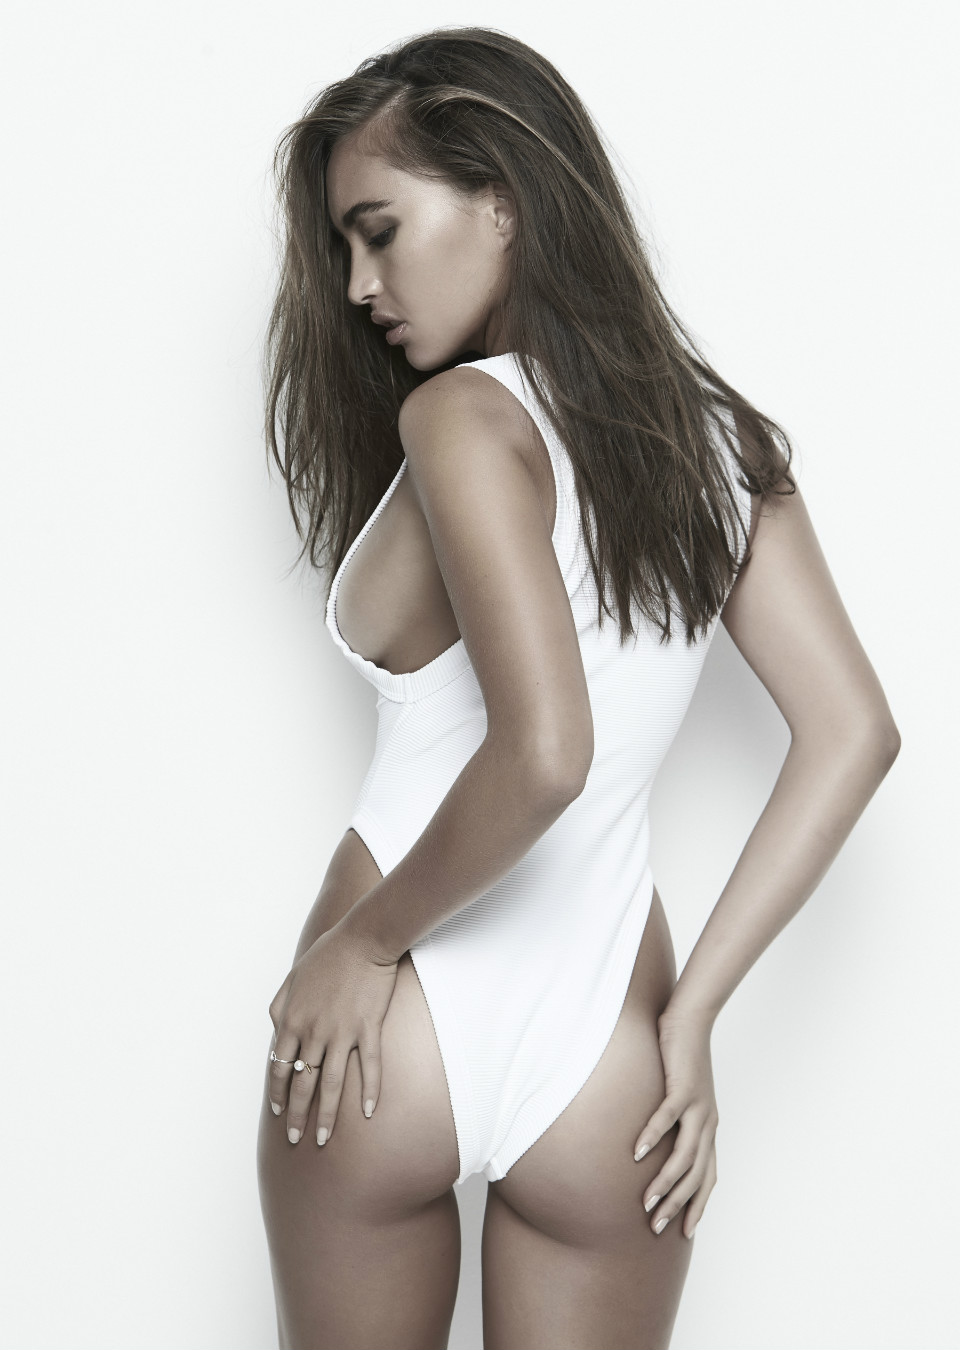 Chanel Stewart Dominique Models Agency